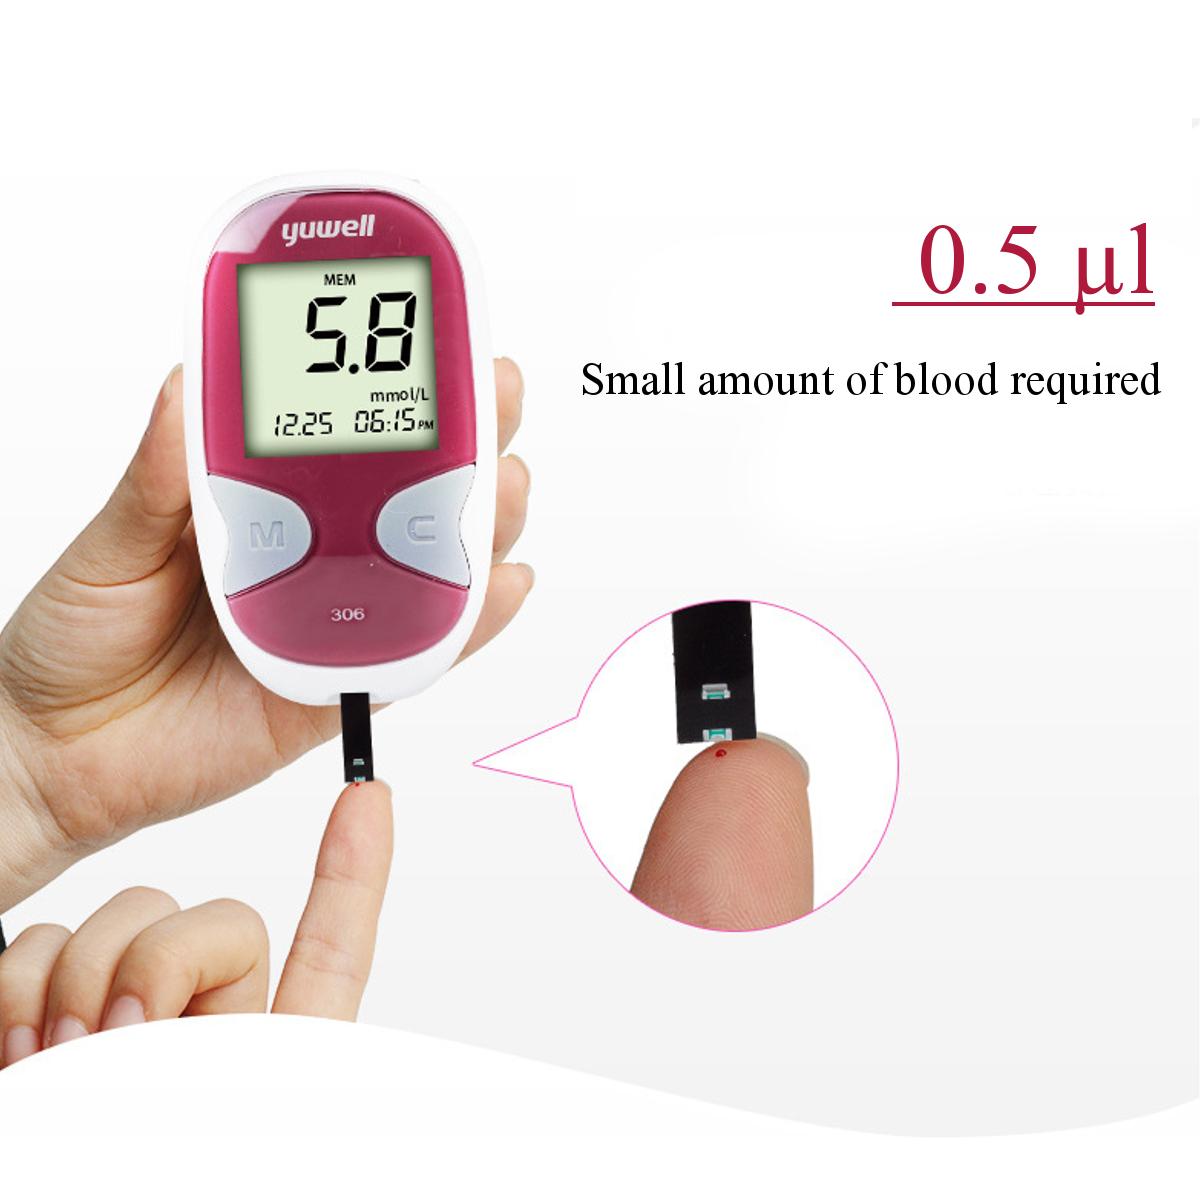 Original Blood Glucose Starter Kit Glucometer Sugar Meter Monitor Diabetes And 50 Test Strips